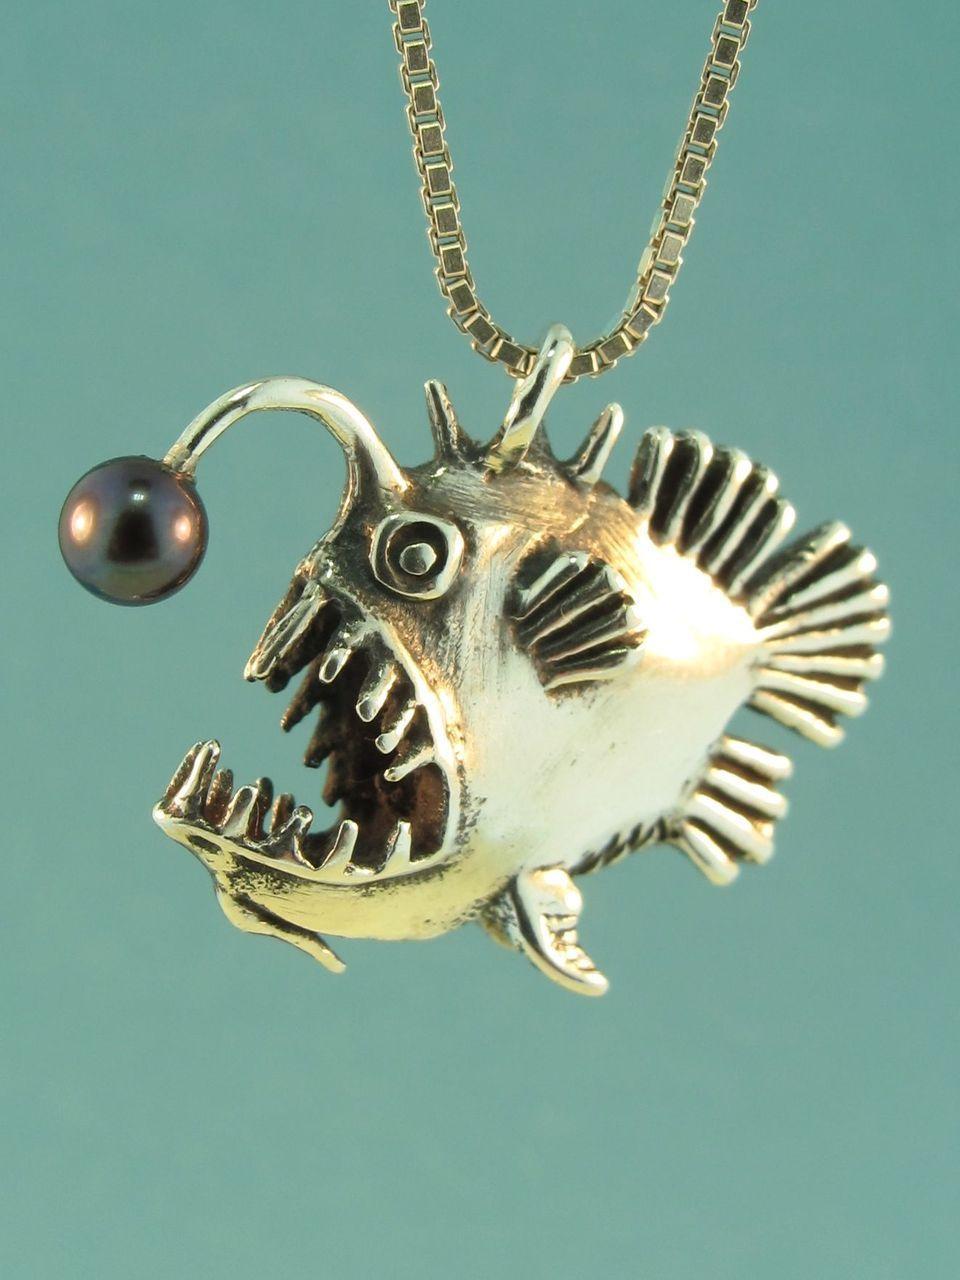 Silver Angler Fish Charm with Black Pearl Silver Angler fish